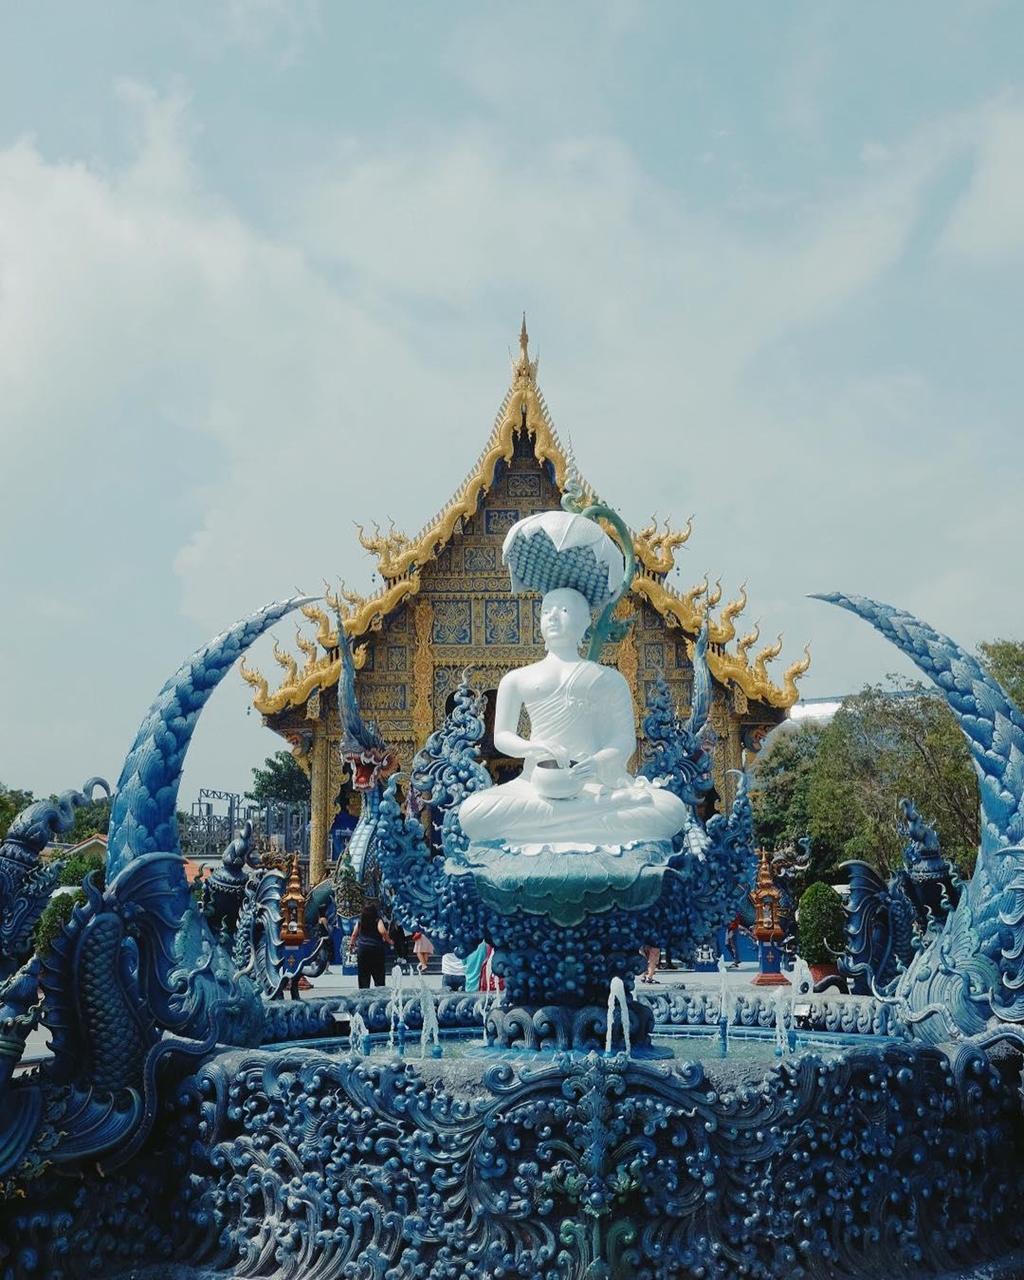 ghe-thai-lan-check-in-song-ao-tai-ngoi-chua-xanh-dat-vang-sang-chanh-ivivu-3